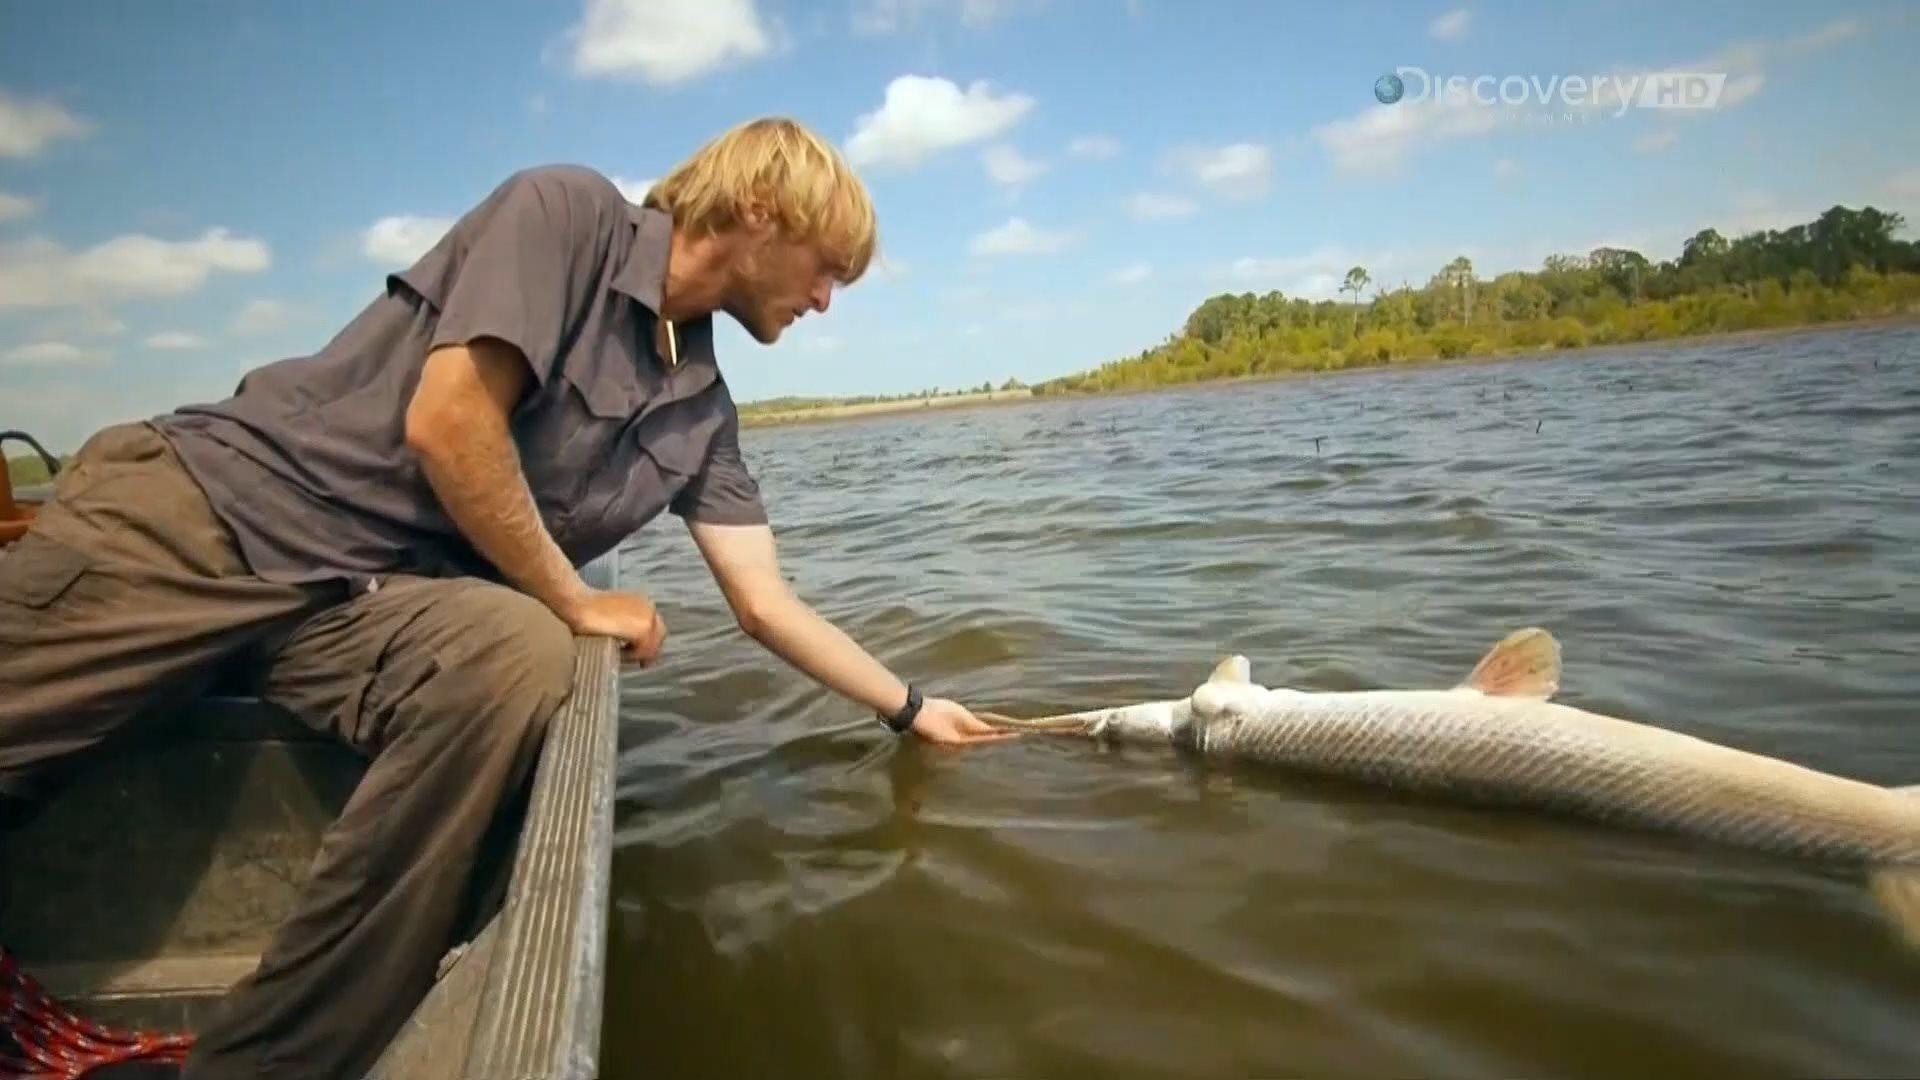 Discovery. Рыбацкие легенды Якуба Вагнера / Rybi Legendy Iakuba Vagnera (2 сезон: 1-6 серии из 6) (2013-2014) HDTV 1080i